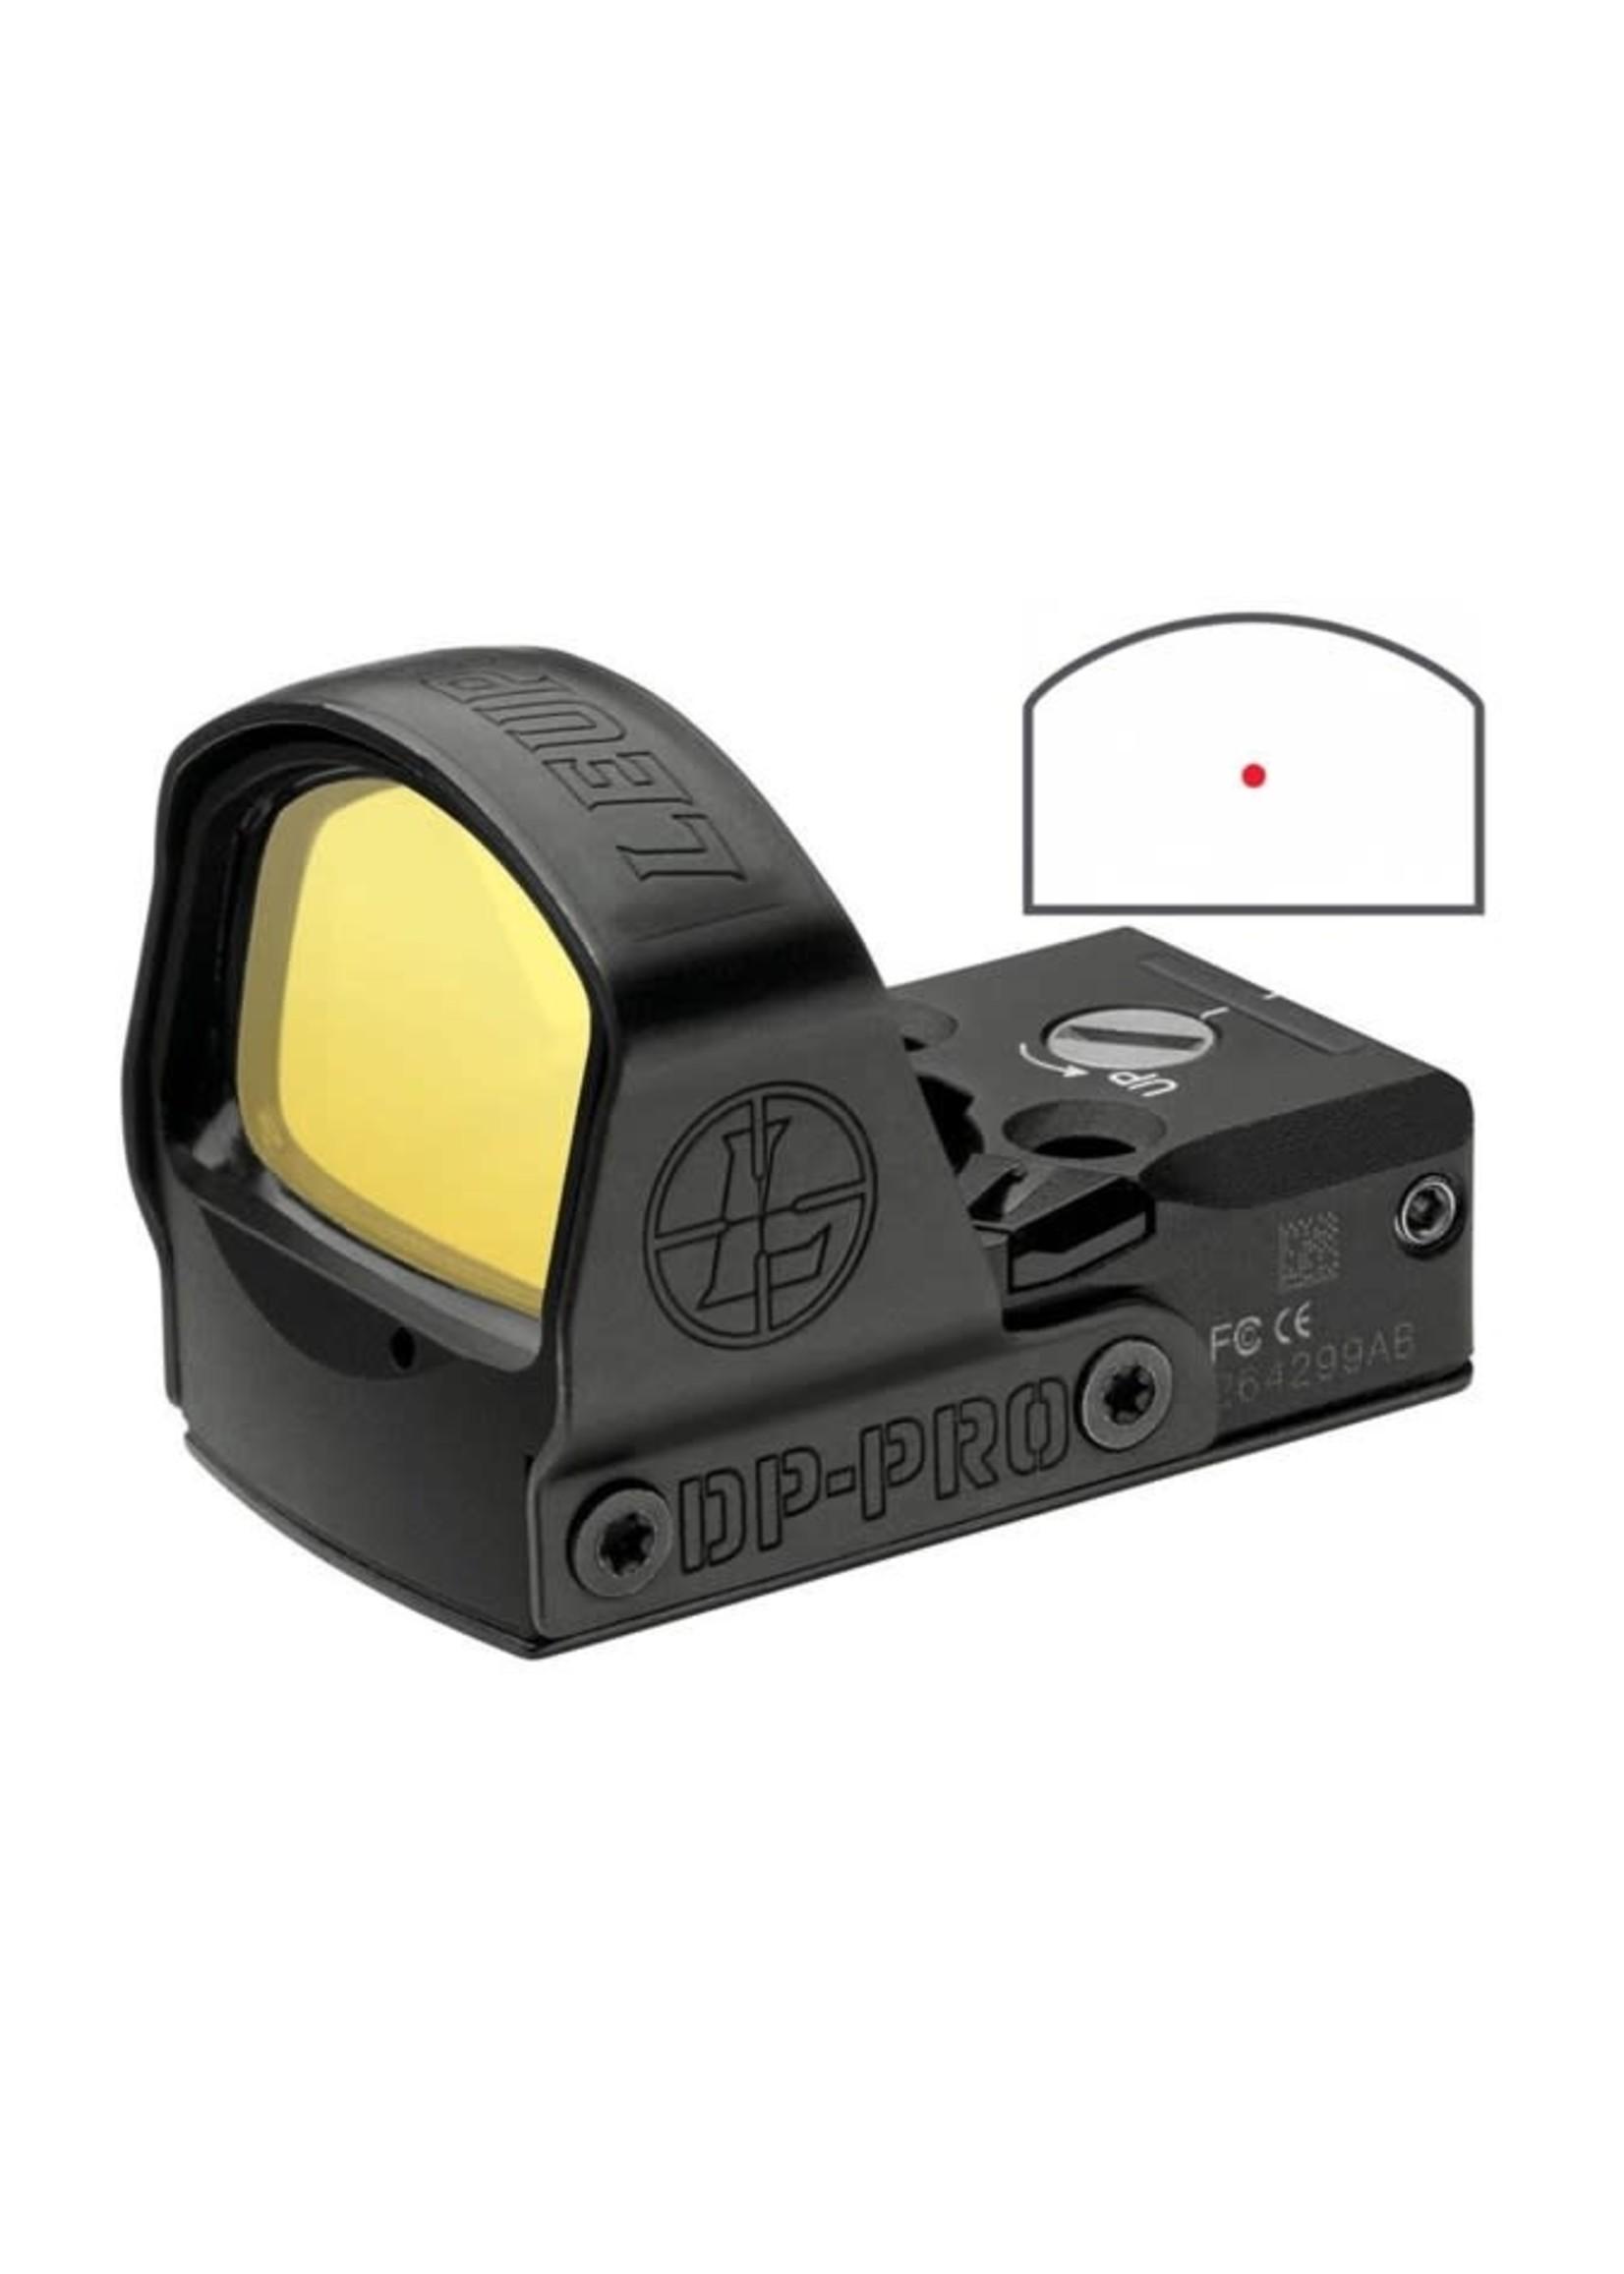 Leupold Leupold Deltapoint Pro Reflex Sight, 6MOA, Illuminated Reticle, Matte Black